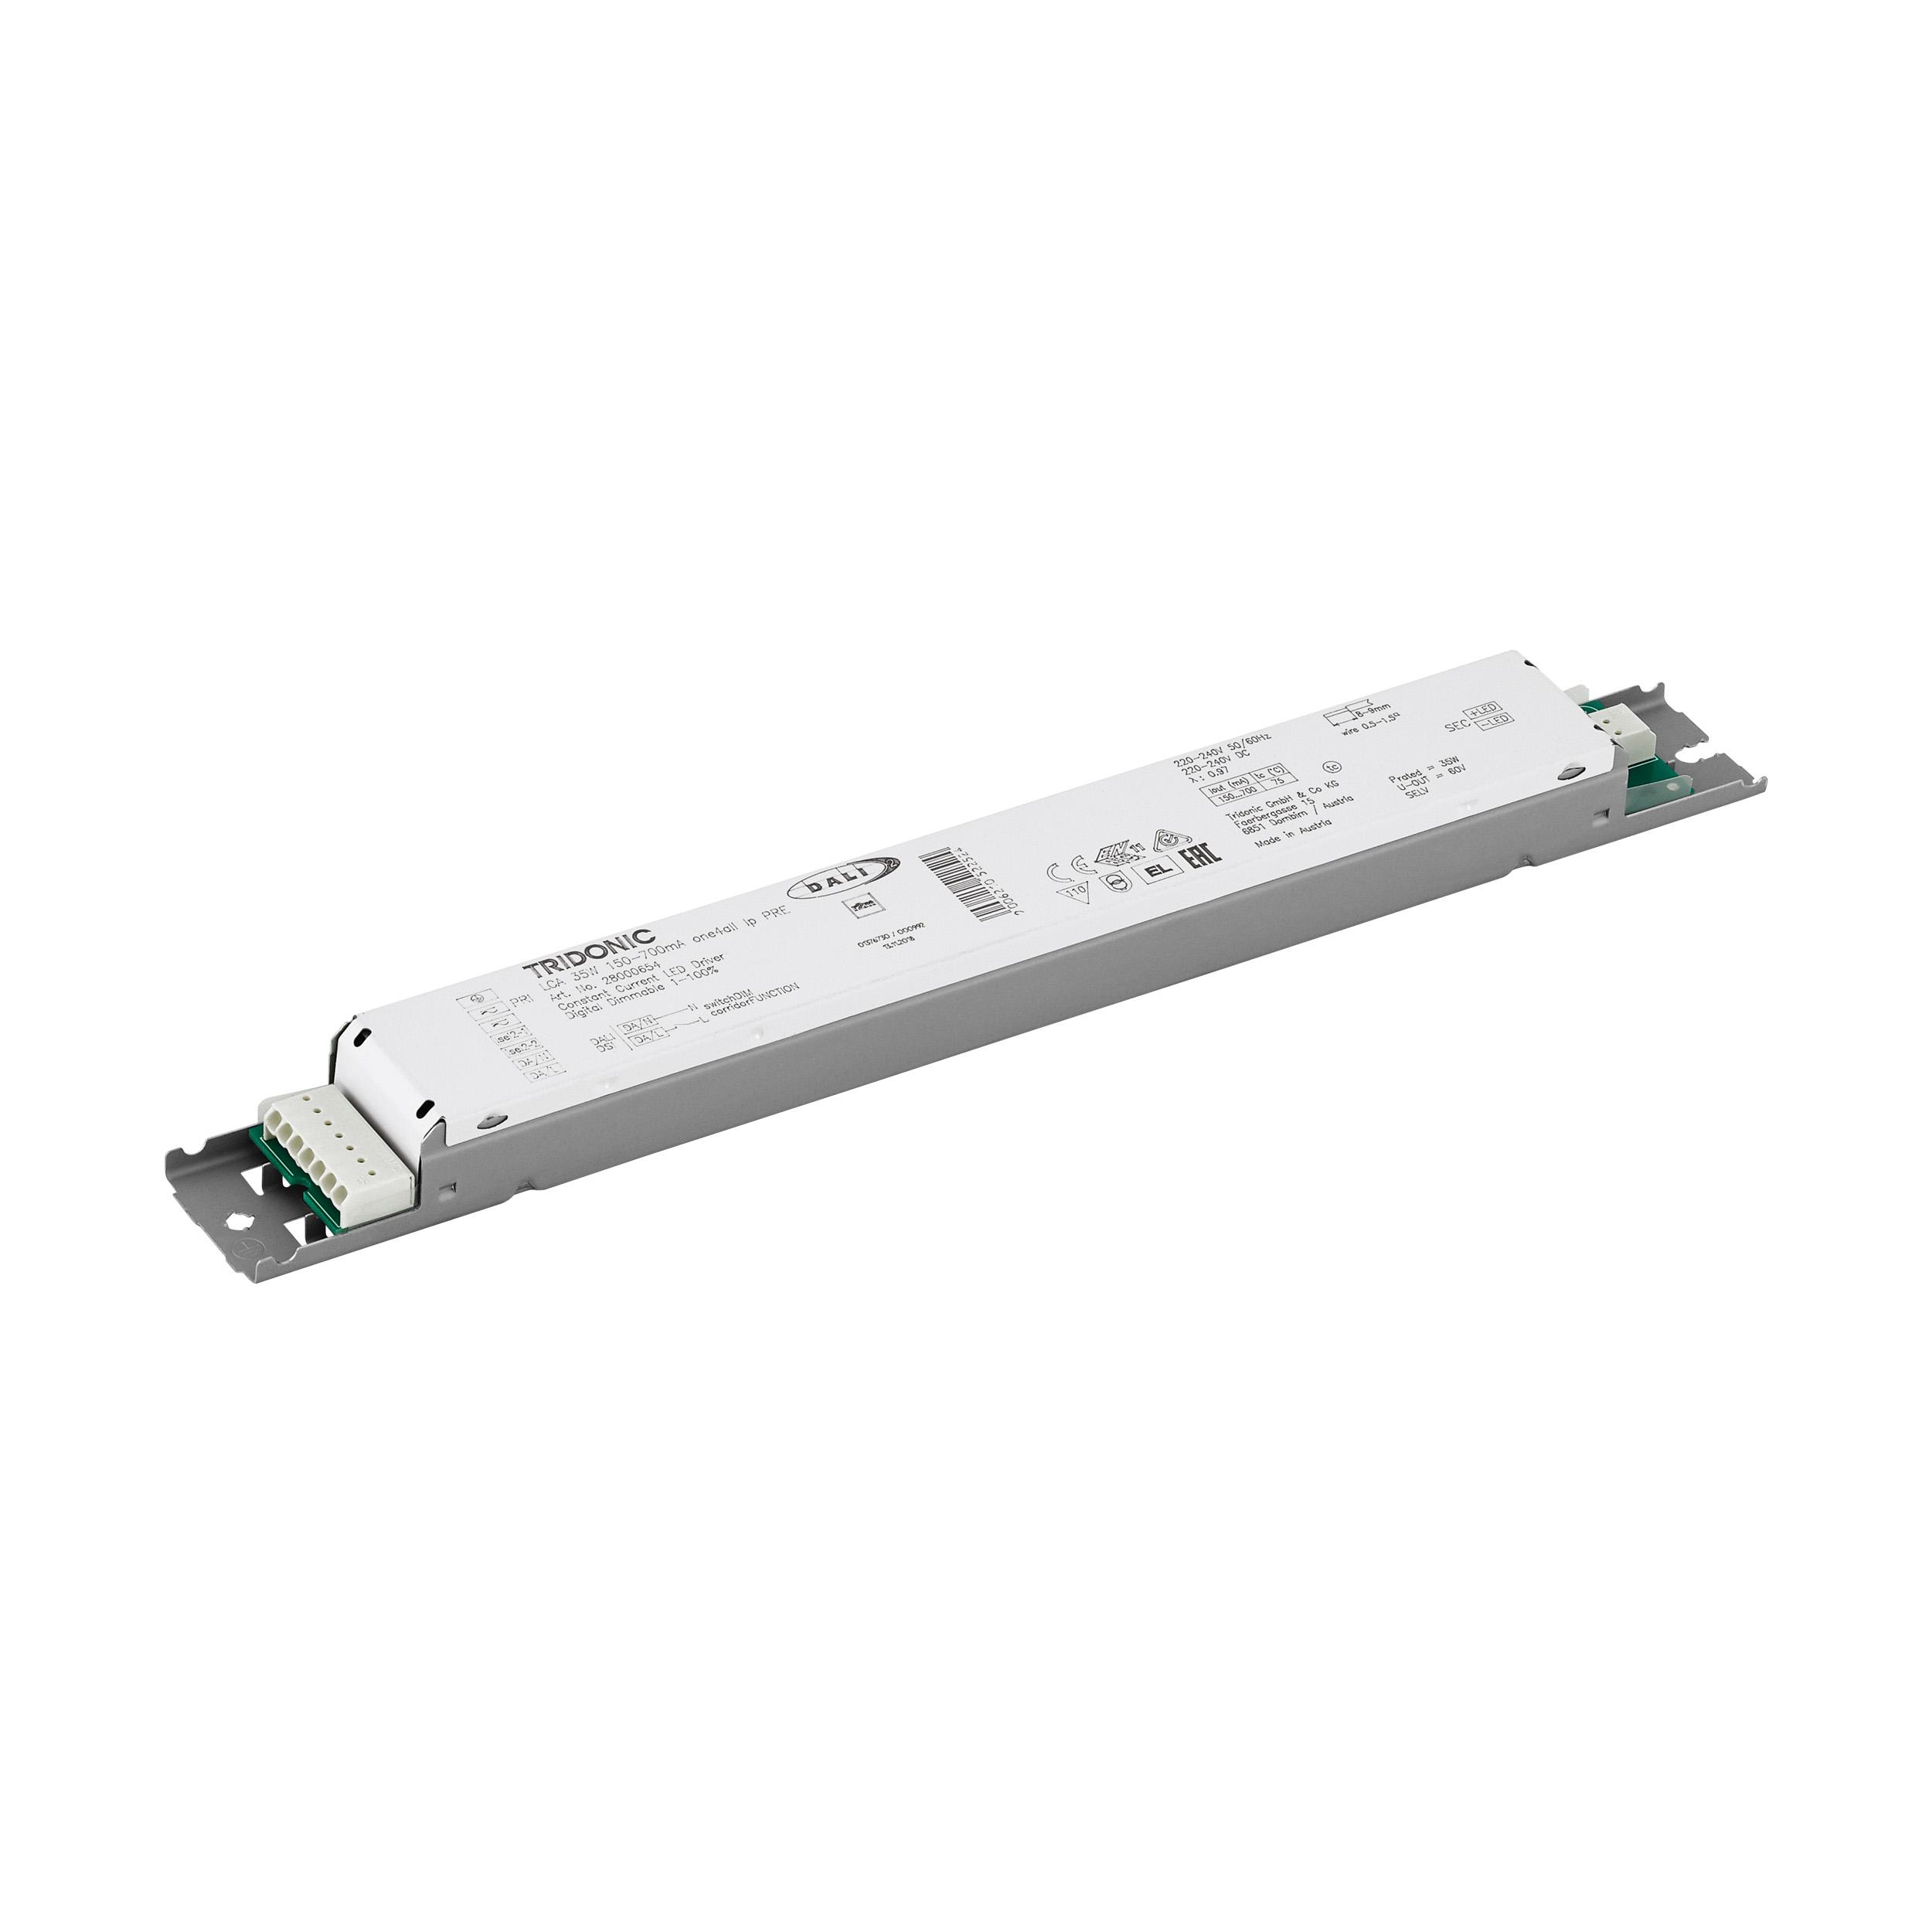 1 Stk LED-DRIVER TRIDONIC LC 50 W 350-1.050 mA LI66339---